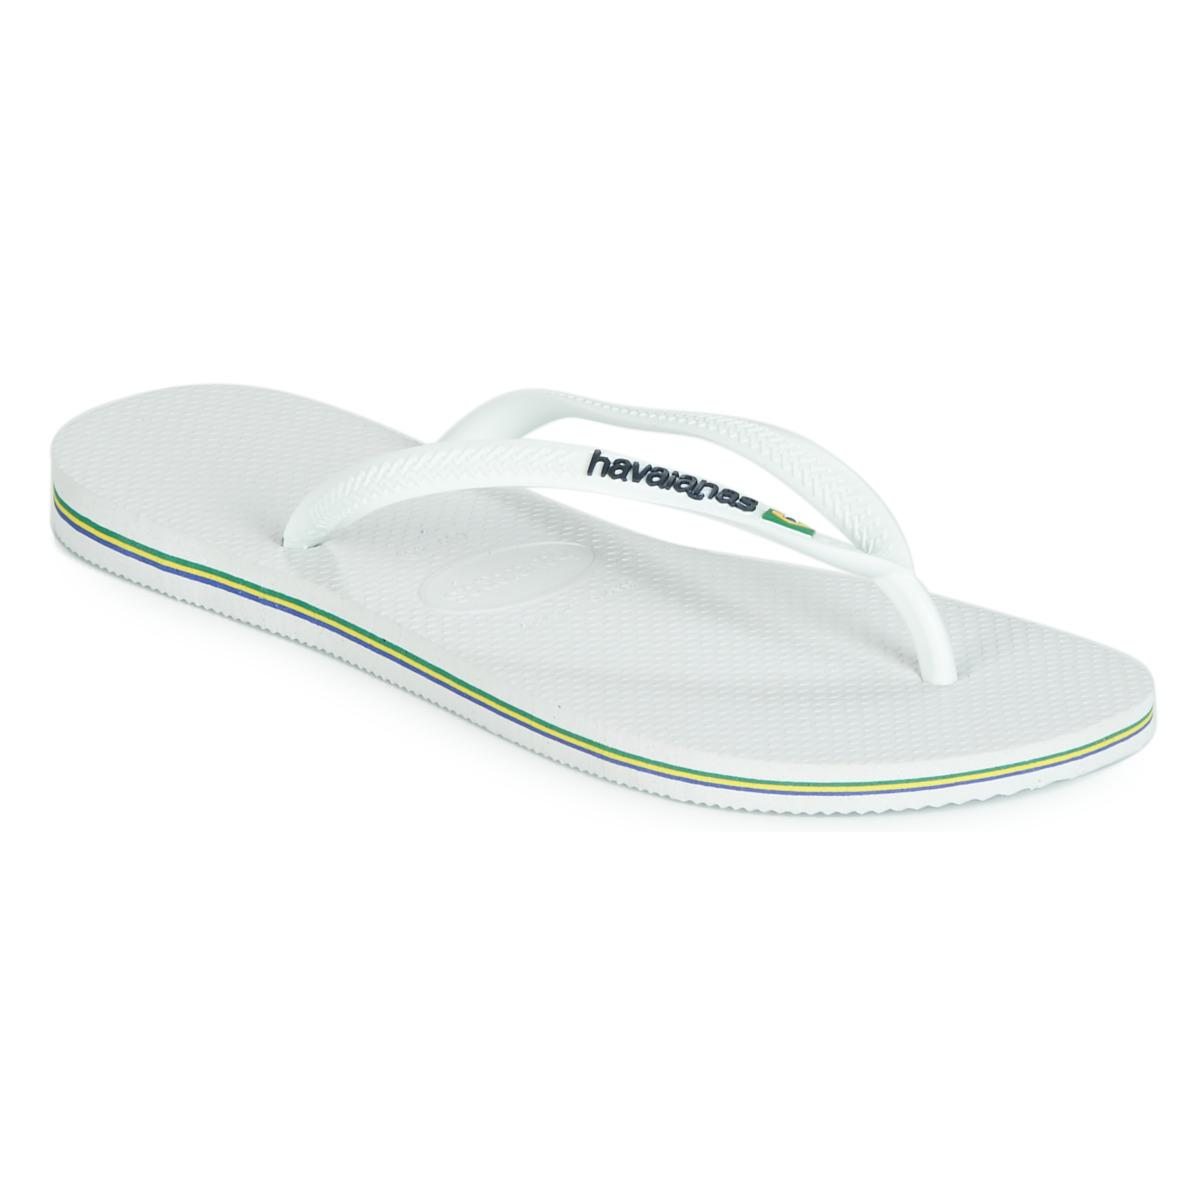 0f6e756571bd Havaianas - White Slim Brasil Logo Flip Flops   Sandals (shoes) - Lyst.  View fullscreen